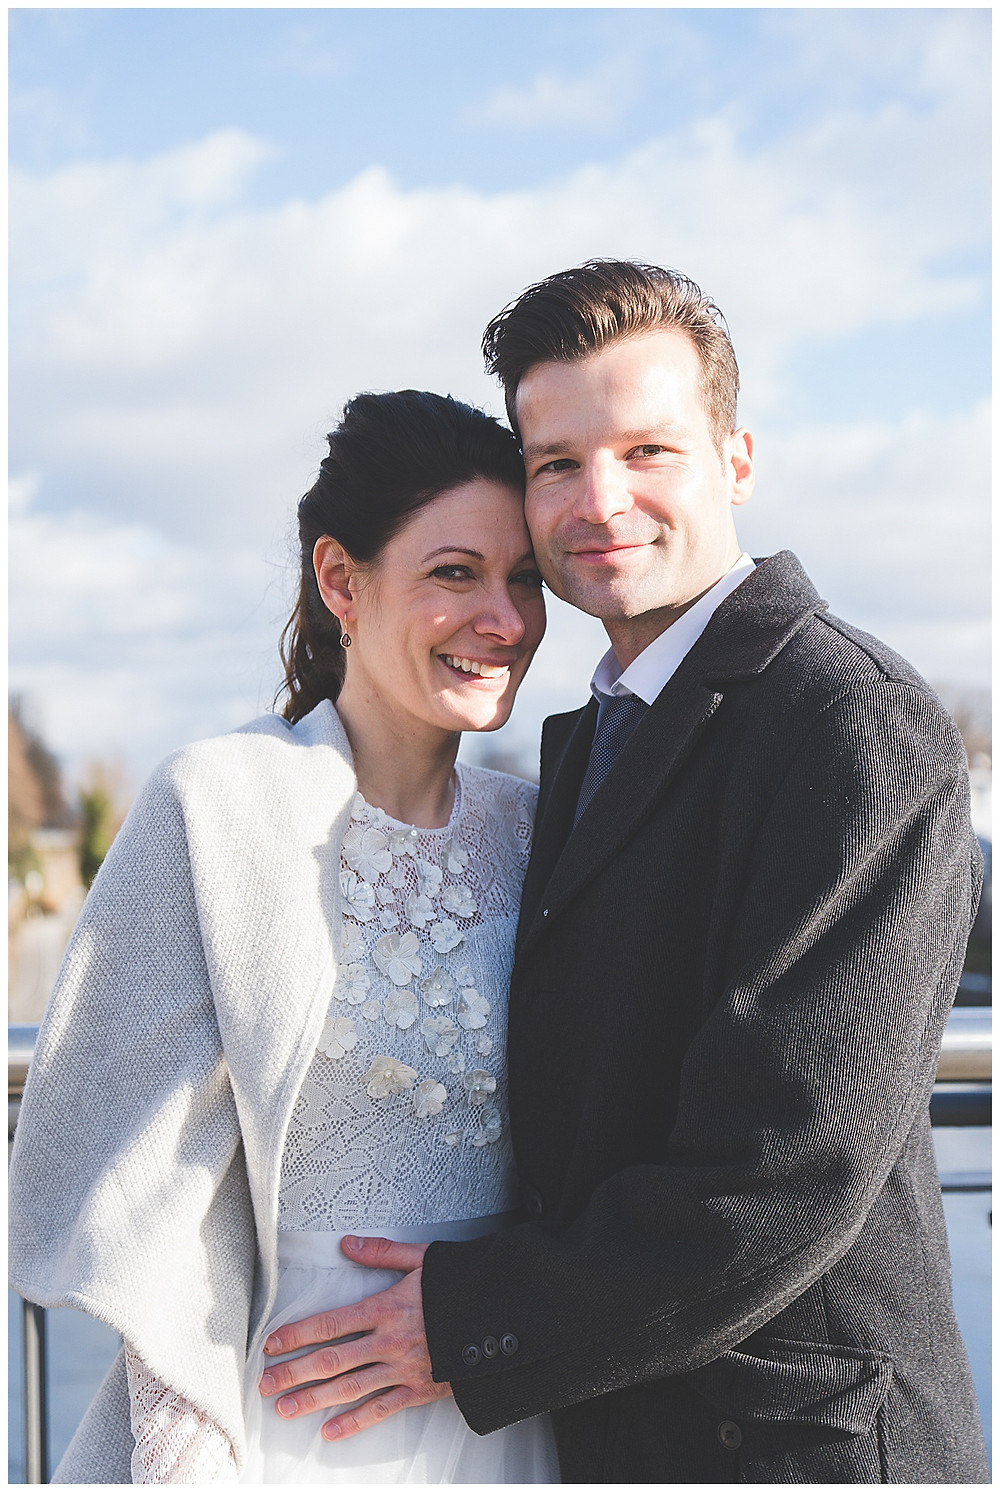 Brautpaar in Neu-Ulm